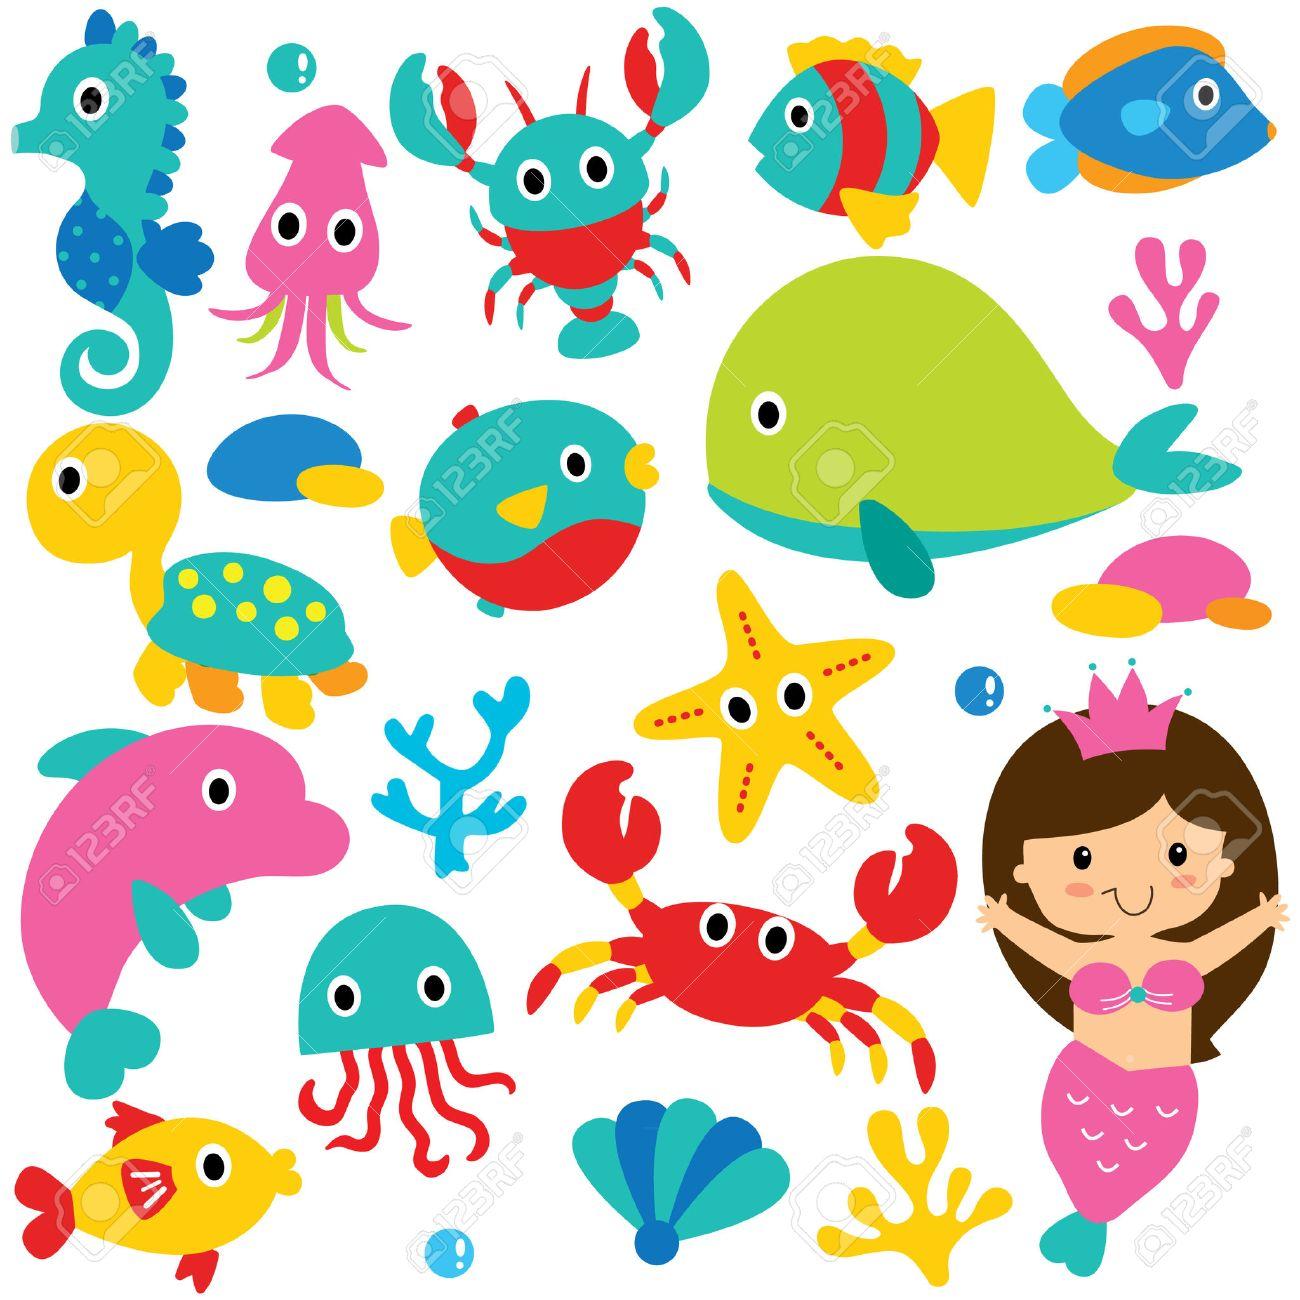 693 Sea Animals free clipart.